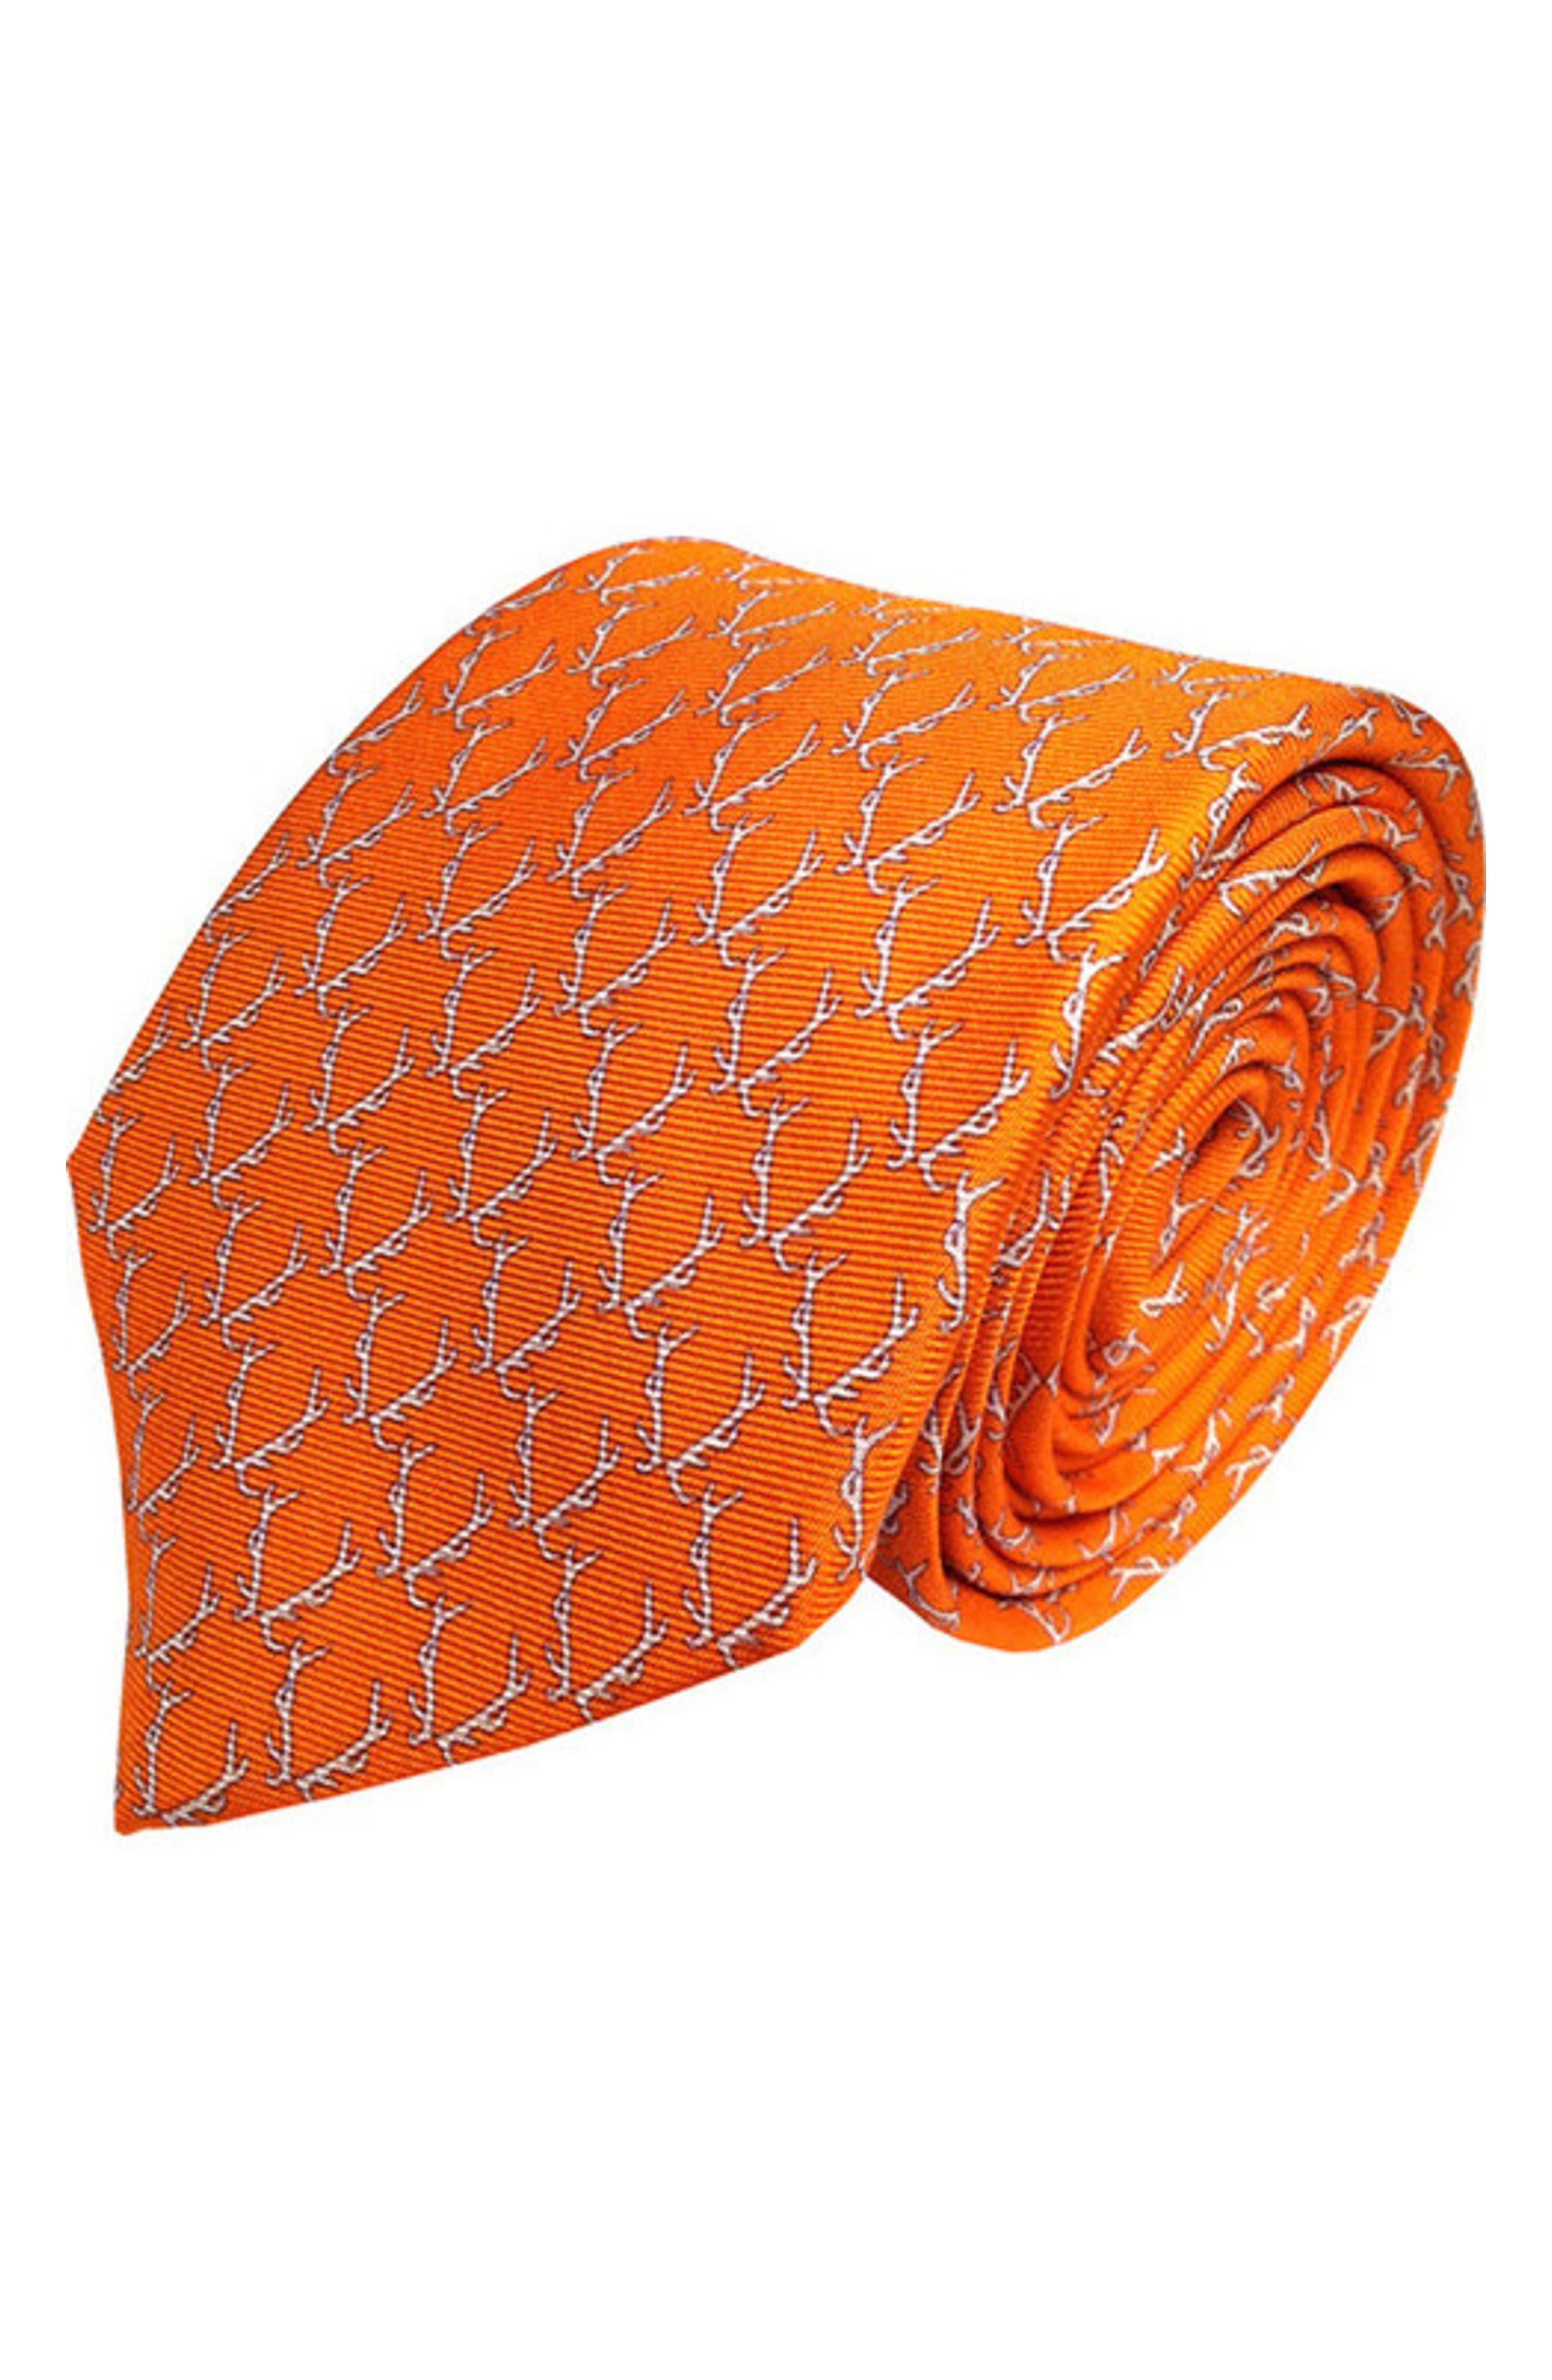 Buckwild Silk Tie,                             Main thumbnail 1, color,                             805